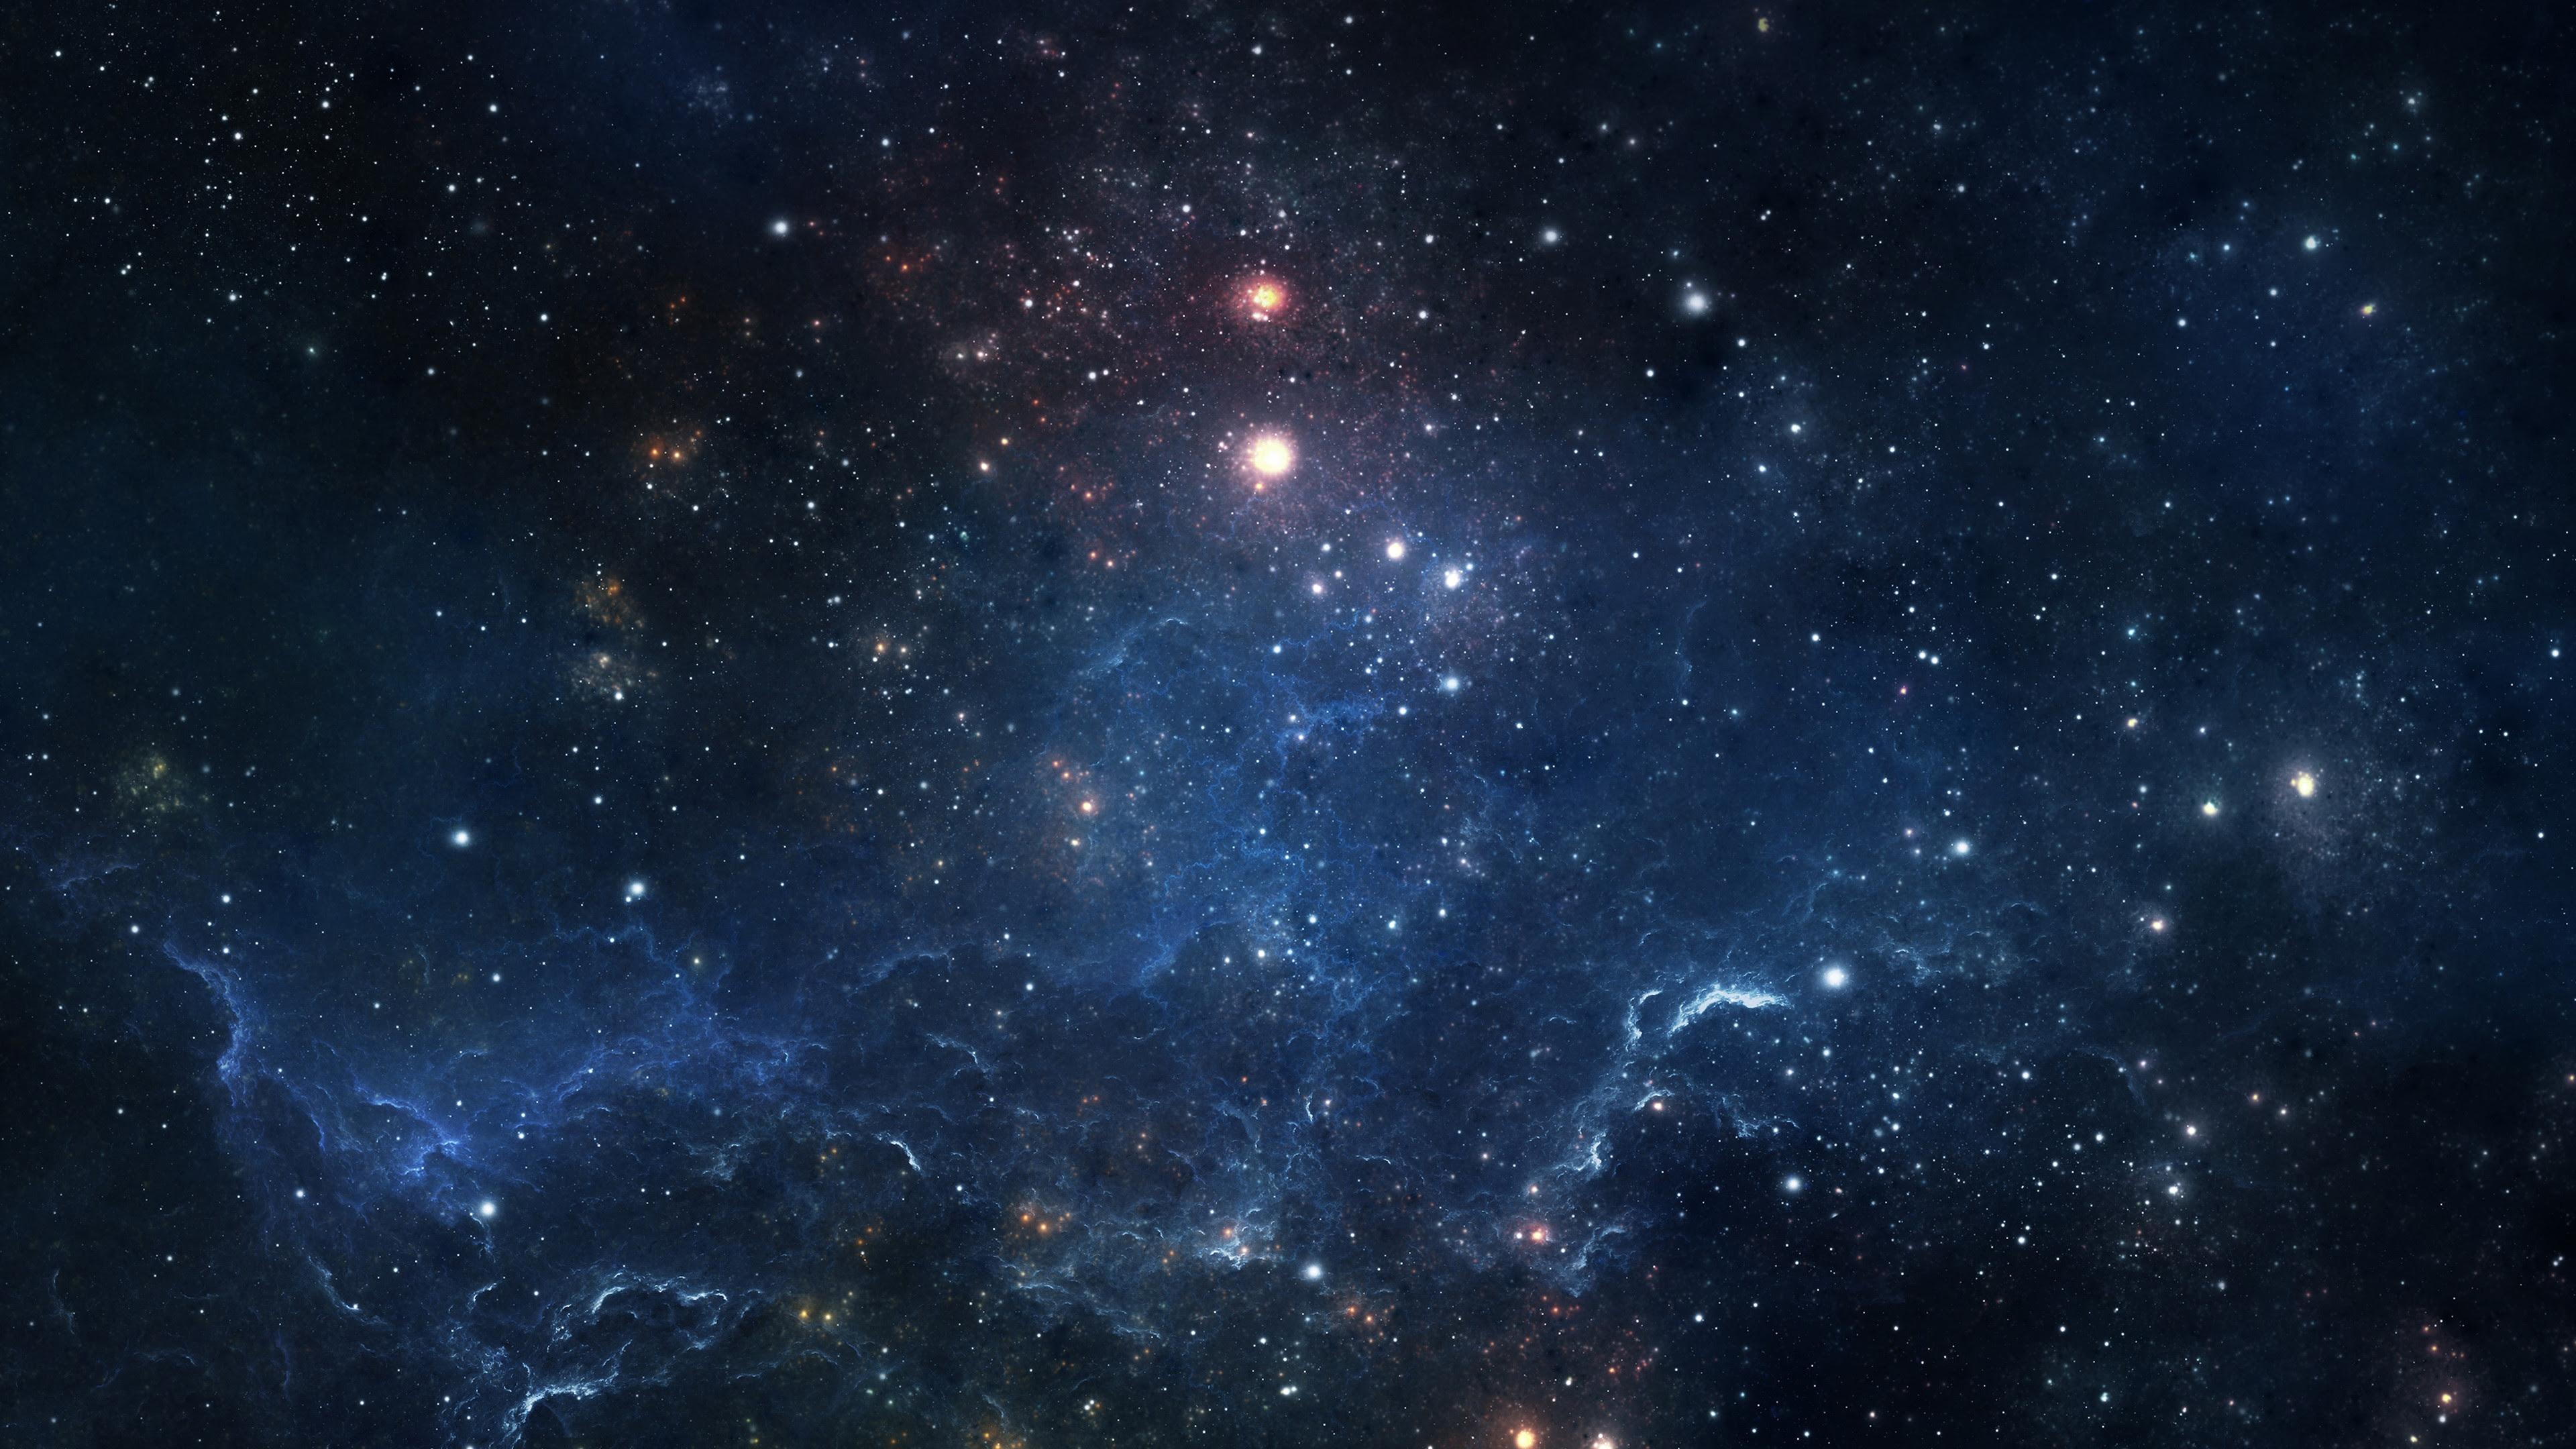 4K Galaxy Wallpaper (62+ images)